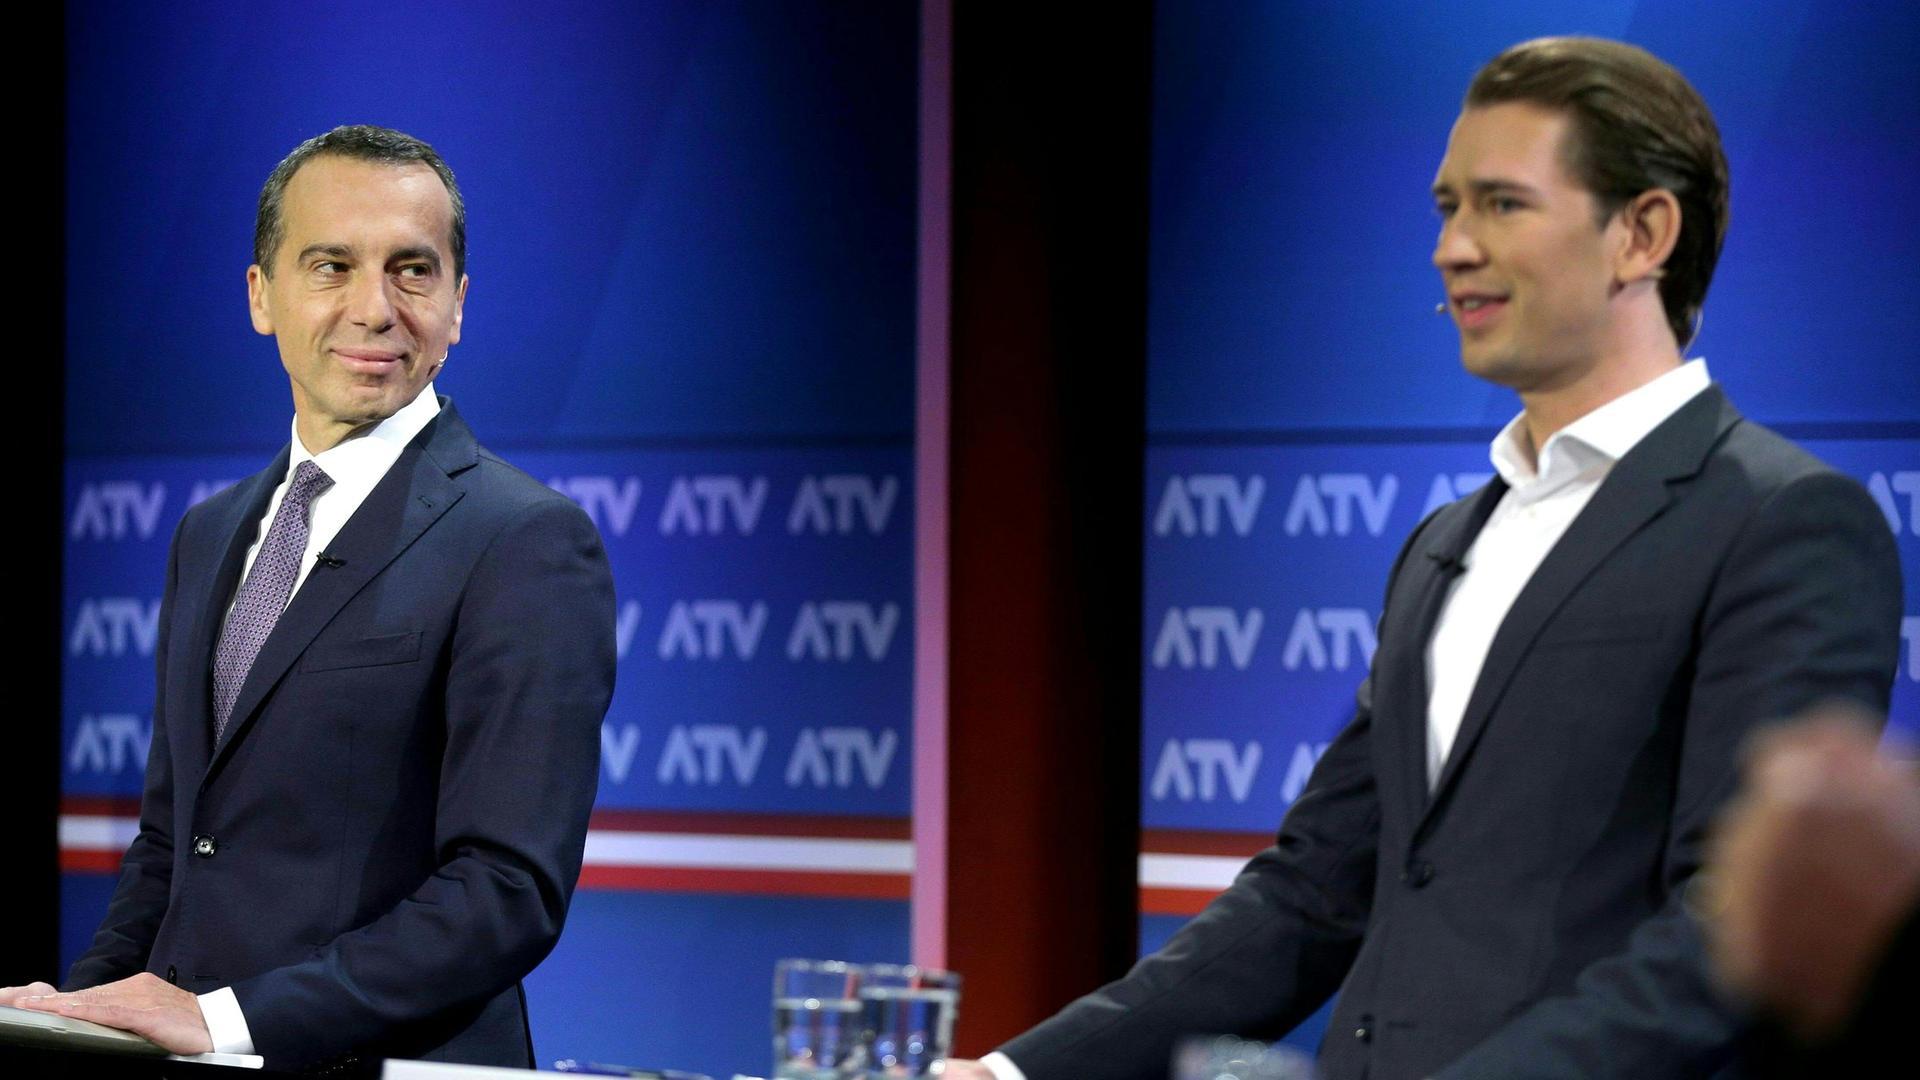 Sebastian Kurz and Christian Kern face off in a debate